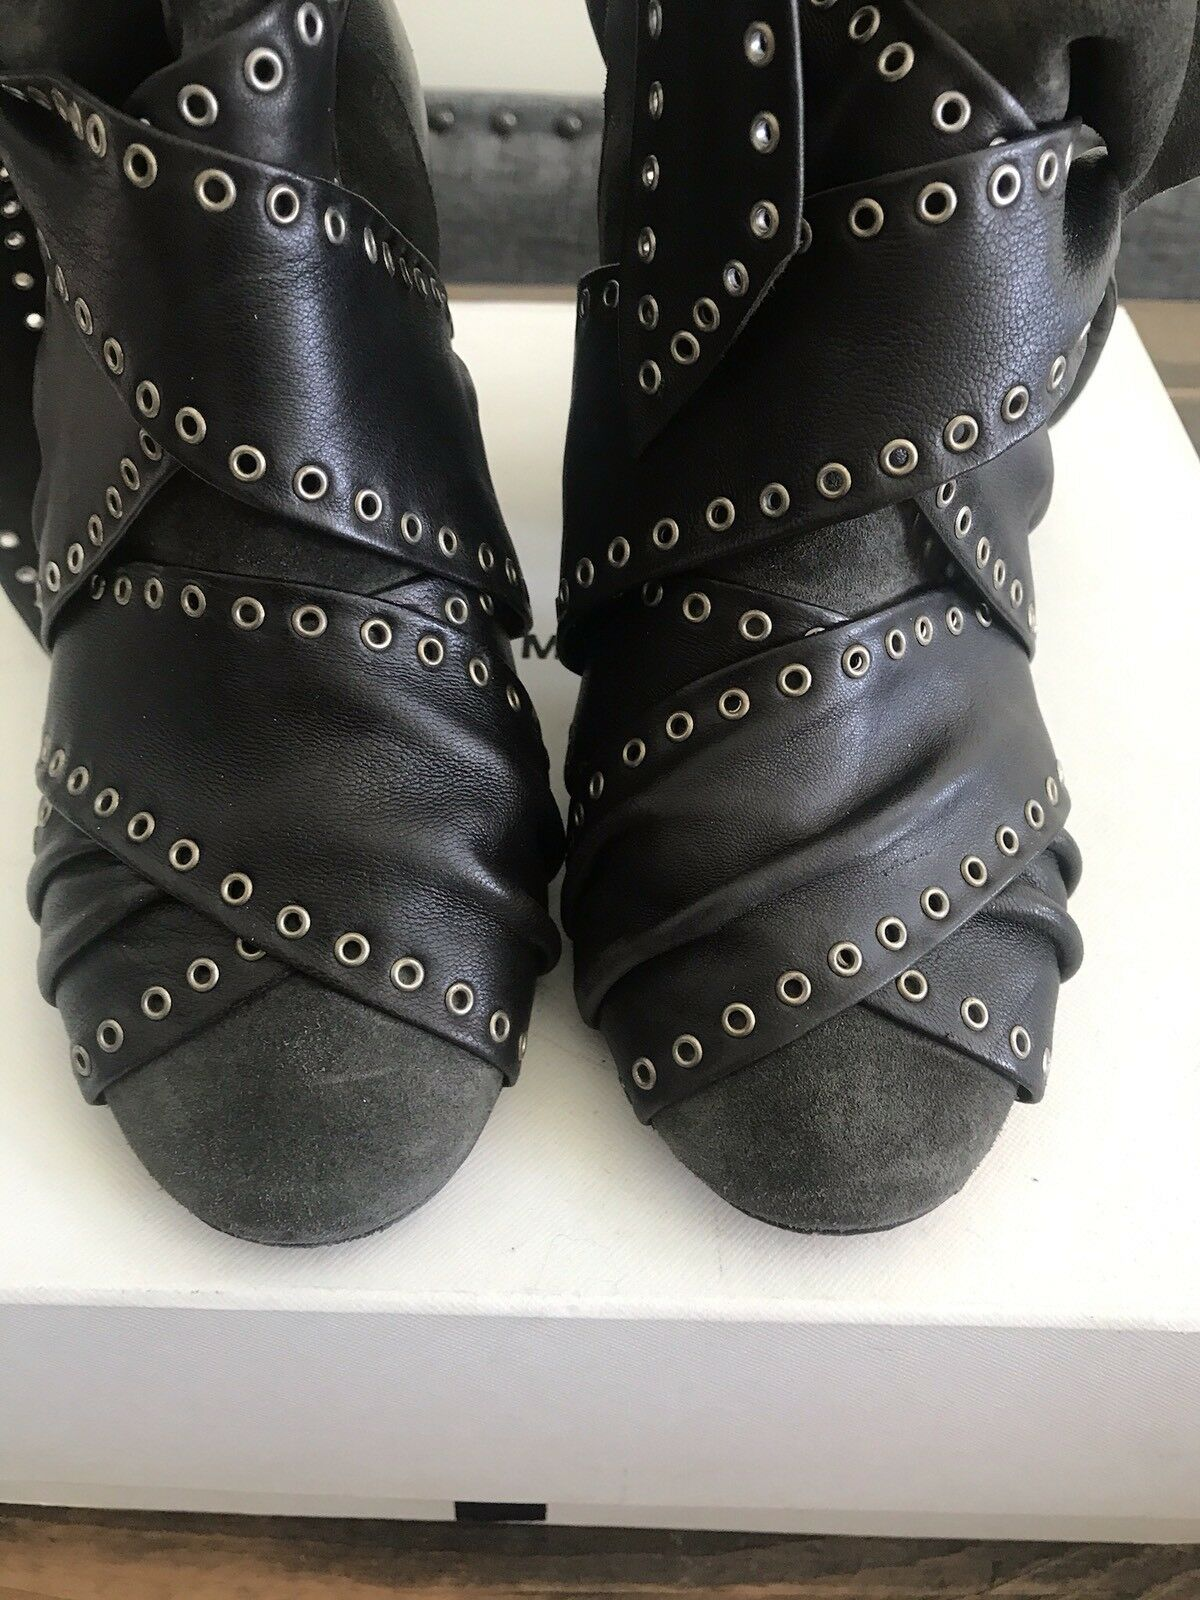 Isabel marant Wrap Leather Suede Suede Suede Olive Grün Ankle Stiefel Stiefelies Größe 7 1f78b0